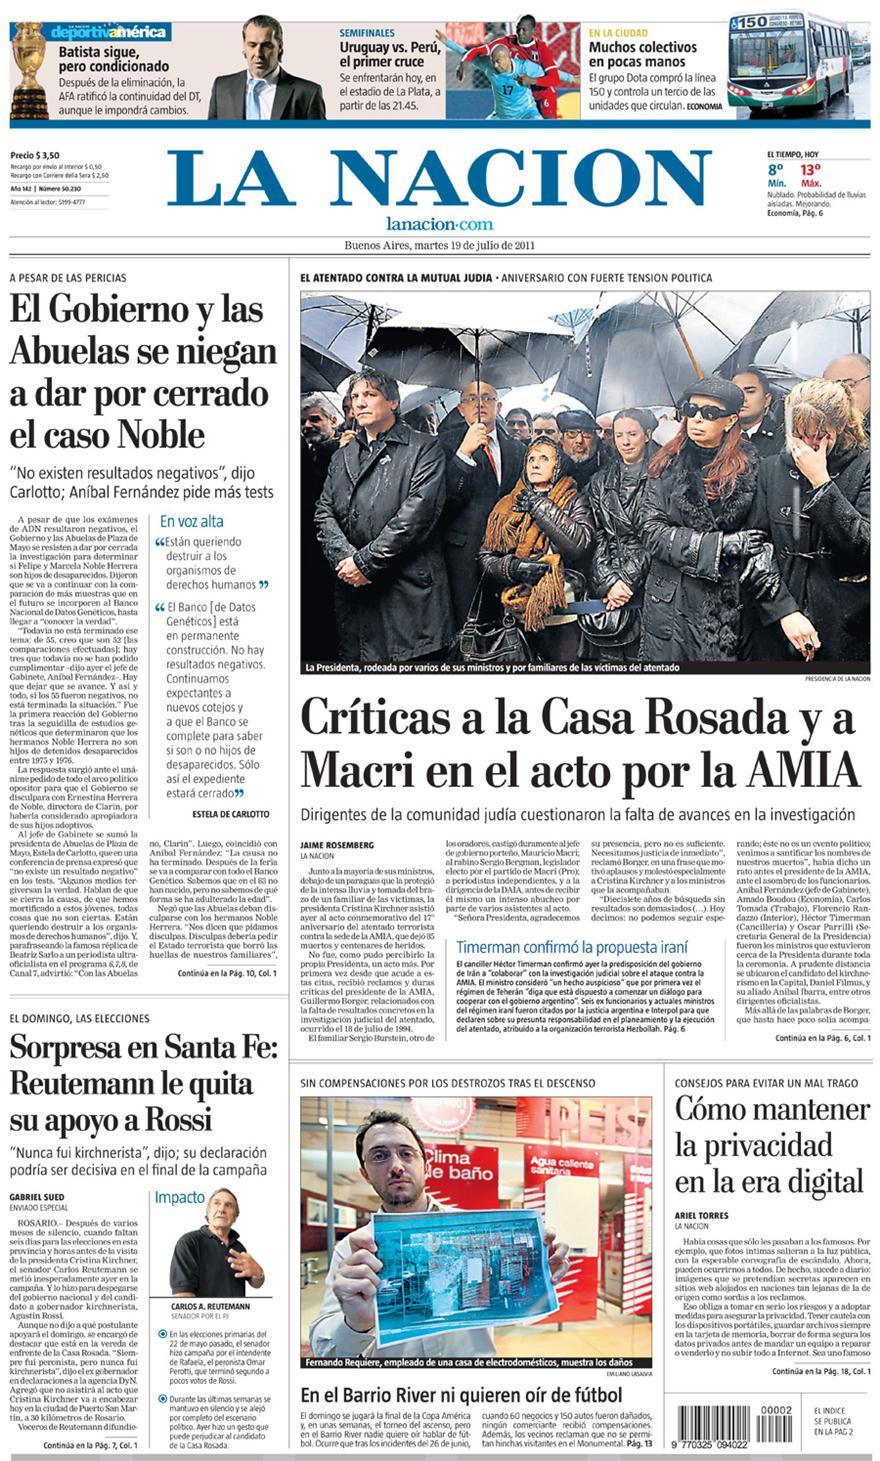 Tapa diarios la nacion clarin 19 07 11 report show for Diarios del espectaculo